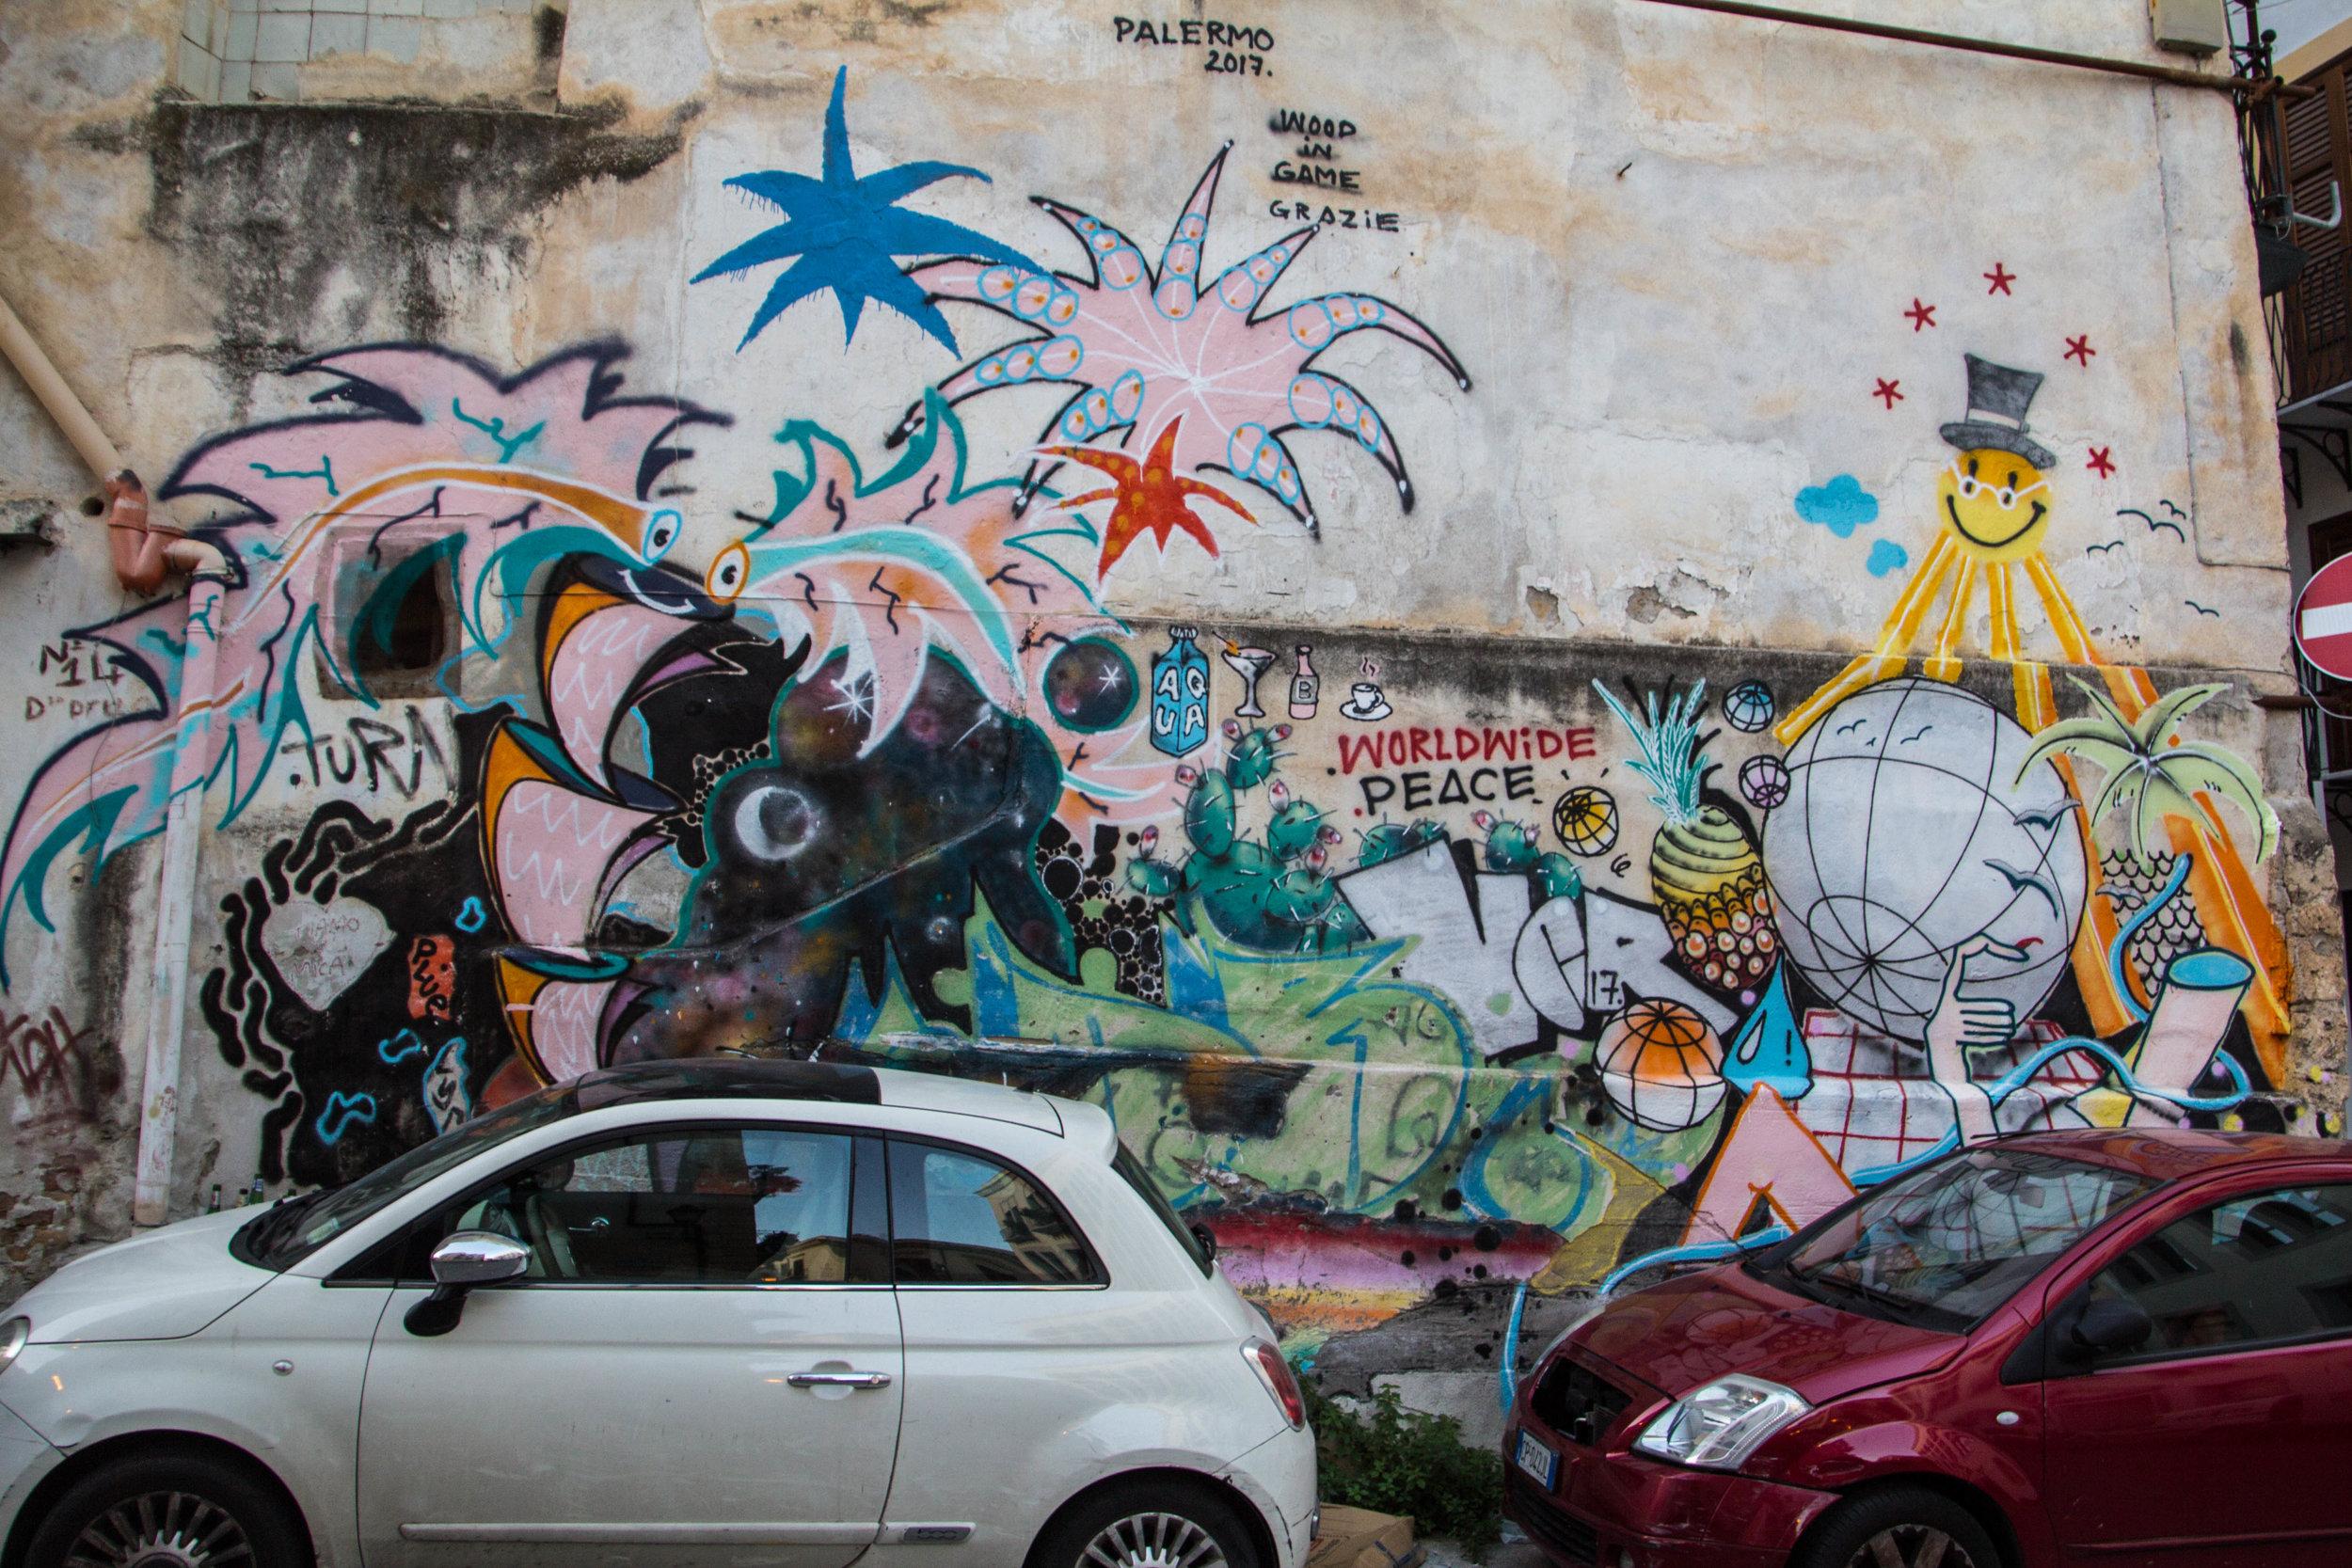 streets-palermo-sicily-26.jpg